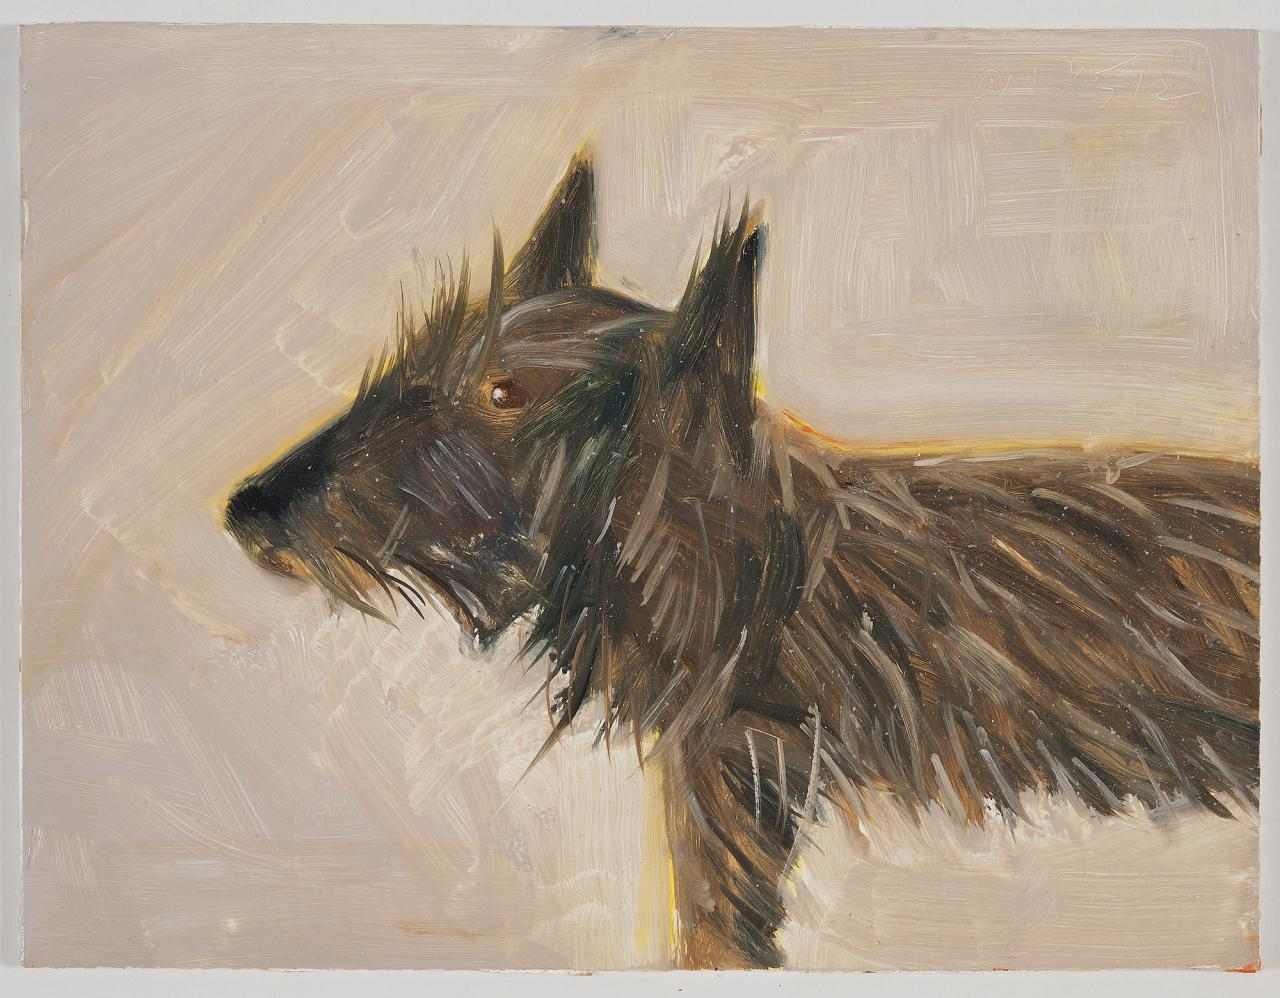 Alex Katz, Untitled (Dog), 2012 Oil on board, 22,9 x 30,5 cm, Copyright Alex Katz / VG Bild-Kunst, Bonn 2019, Courtesy Galerie Klueser